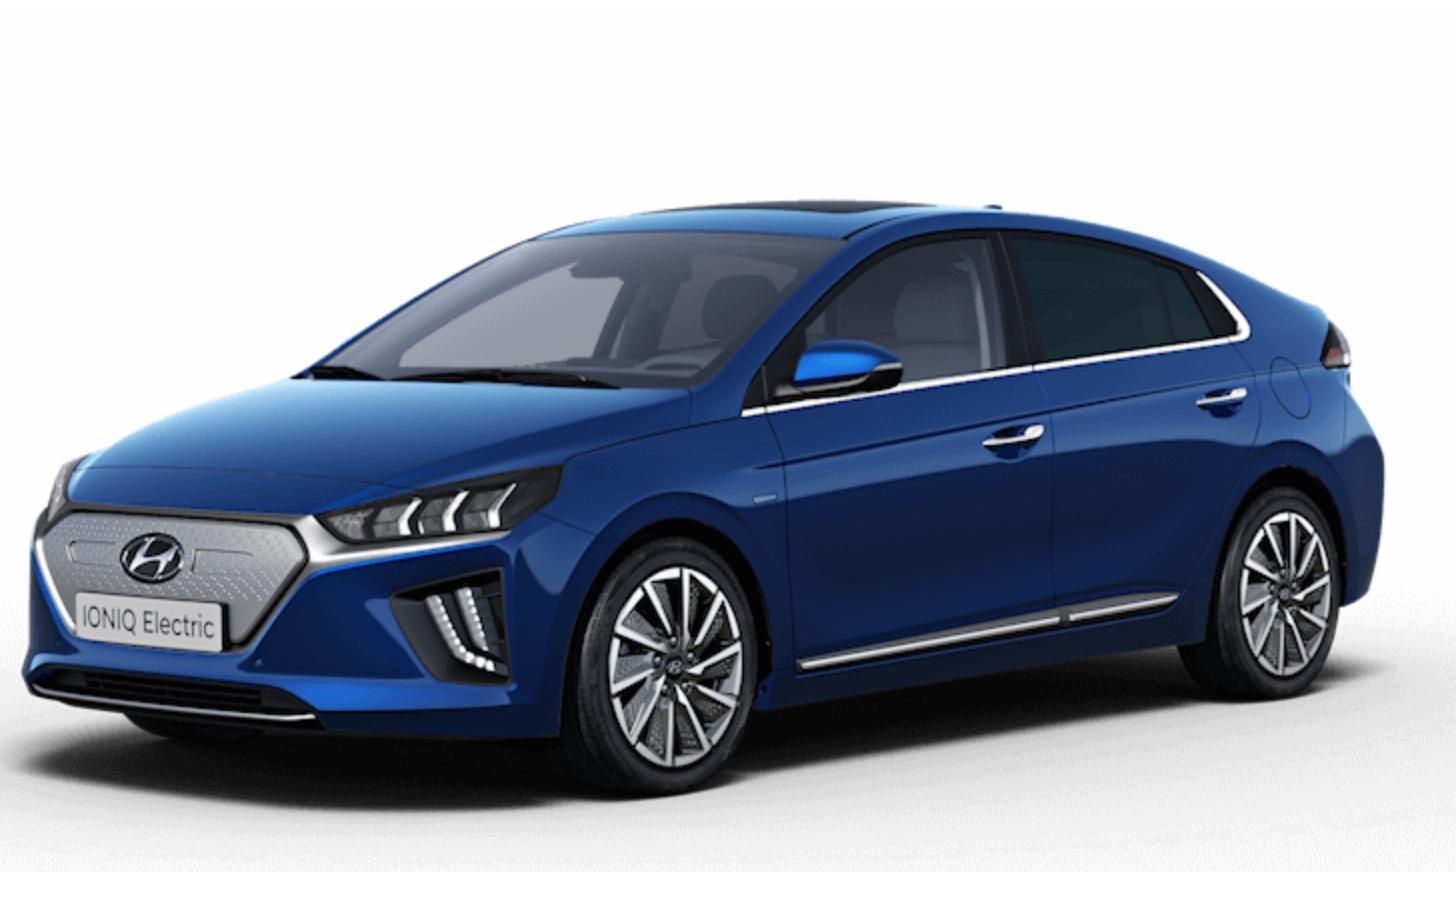 Hyundai Ioniq Electric 100kW Premium 38kWh  - 24m lease - 8k miles p/a - £1134 initial + £189pm + £150 admin = £5631 @ Leasing Options